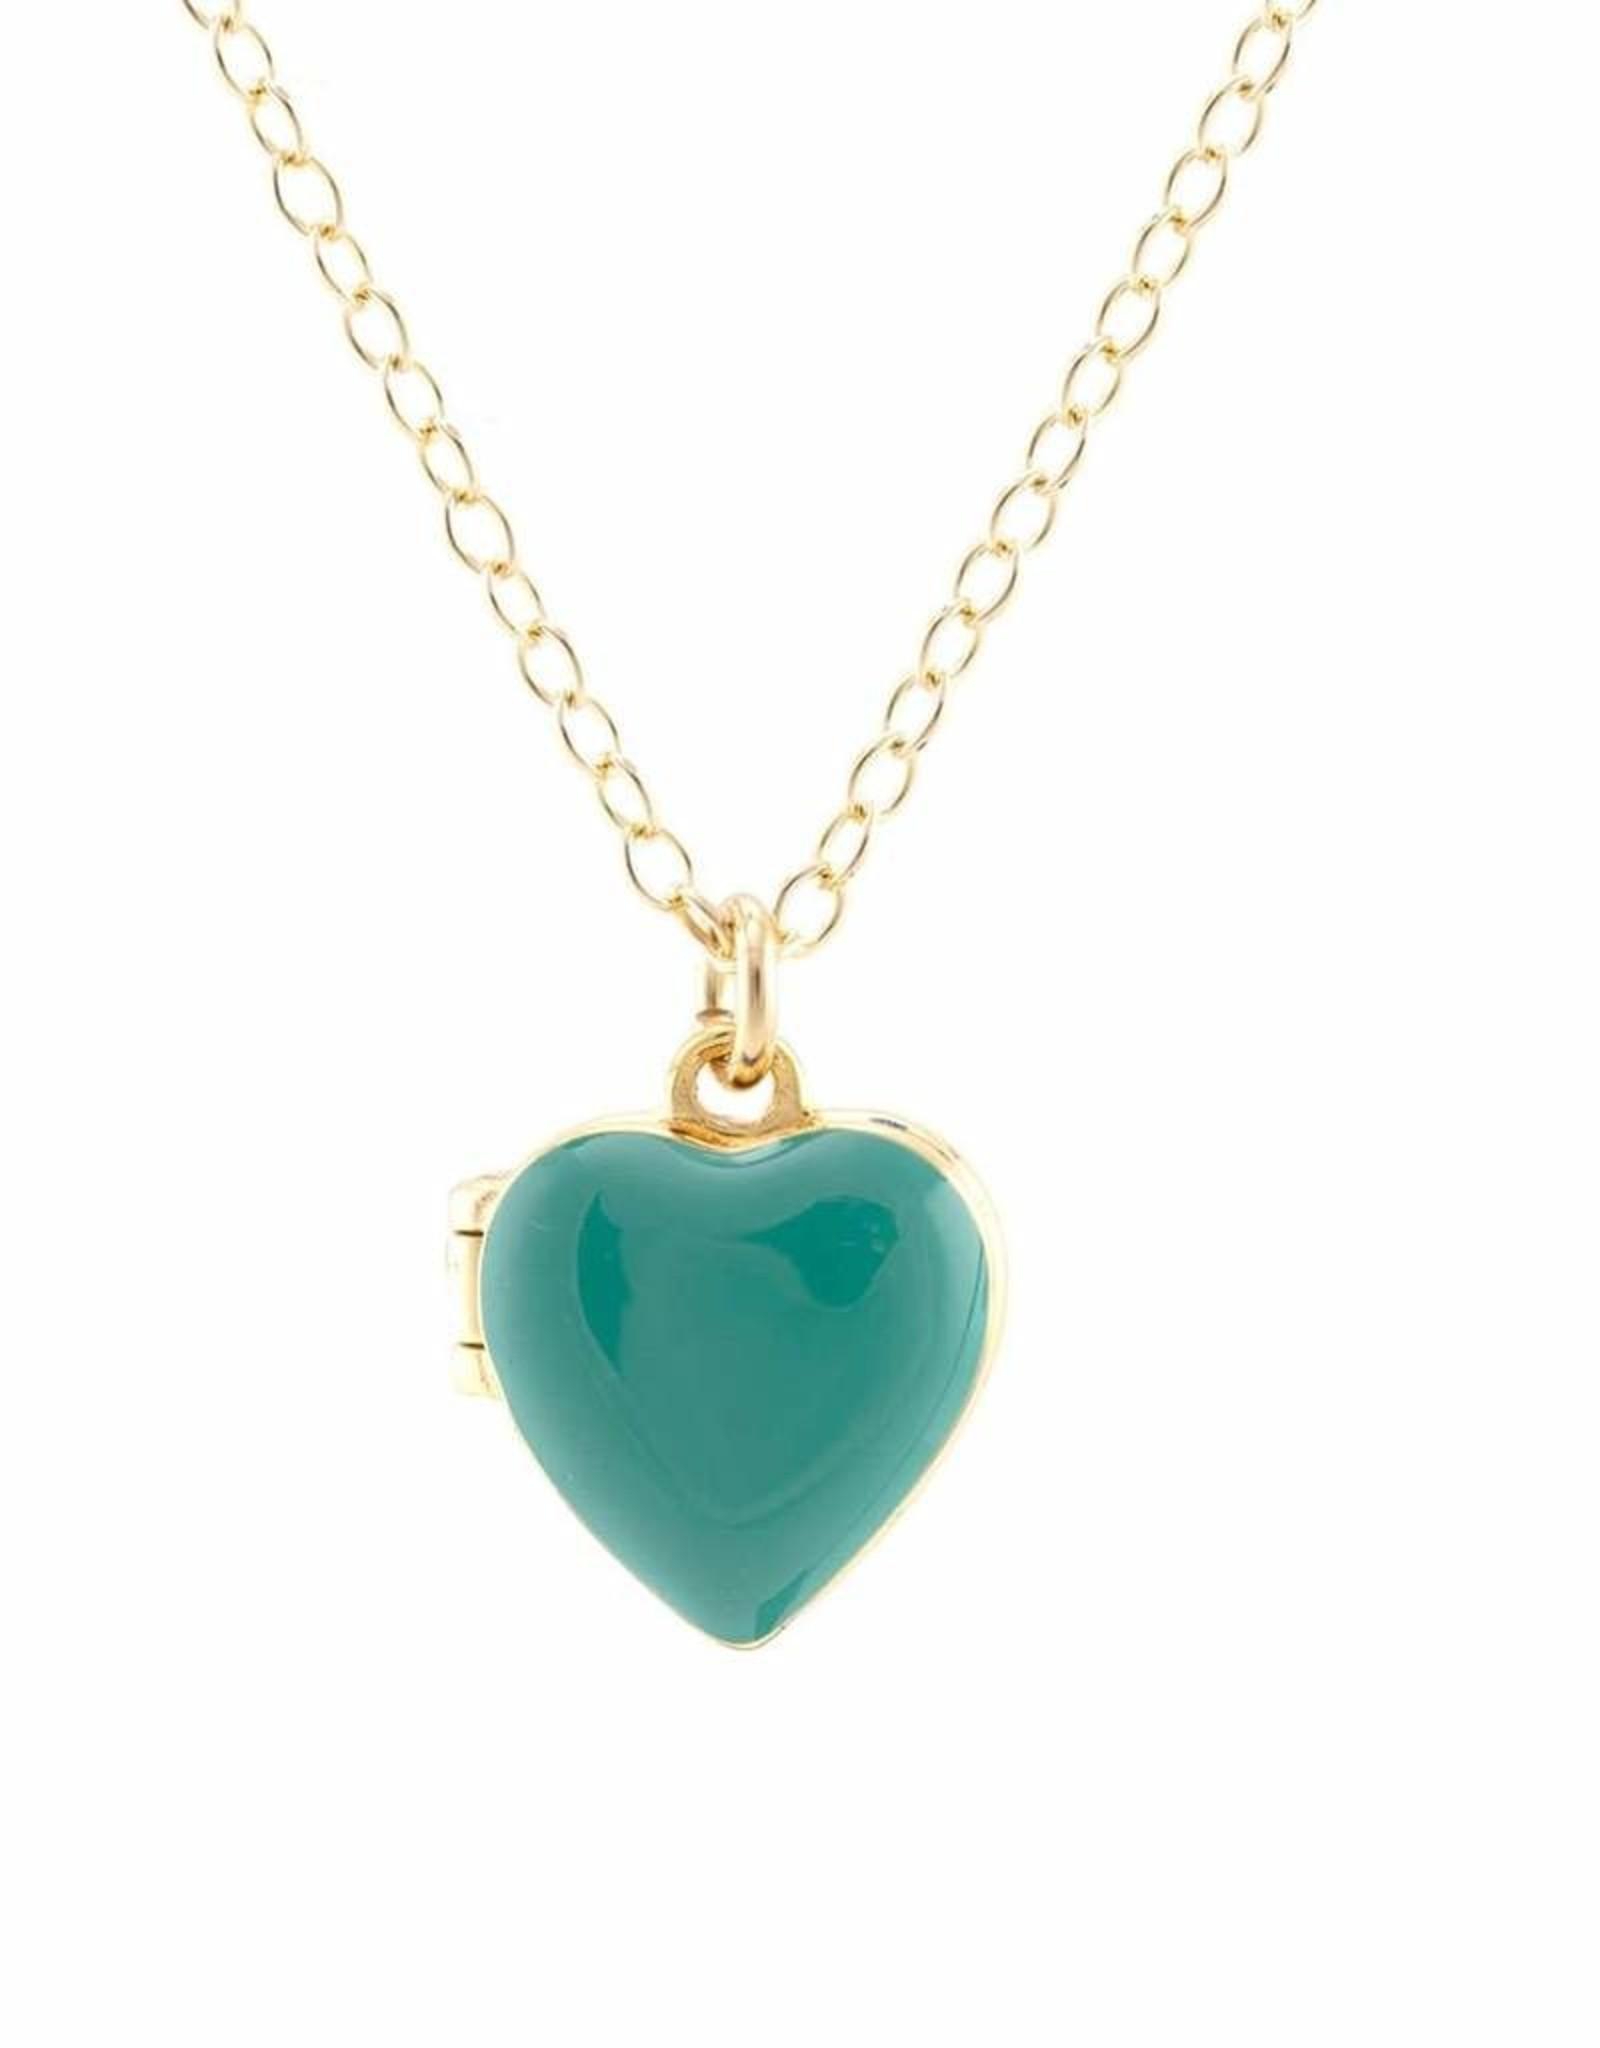 Kris Nations Small Heart Locket in turquoise enamel